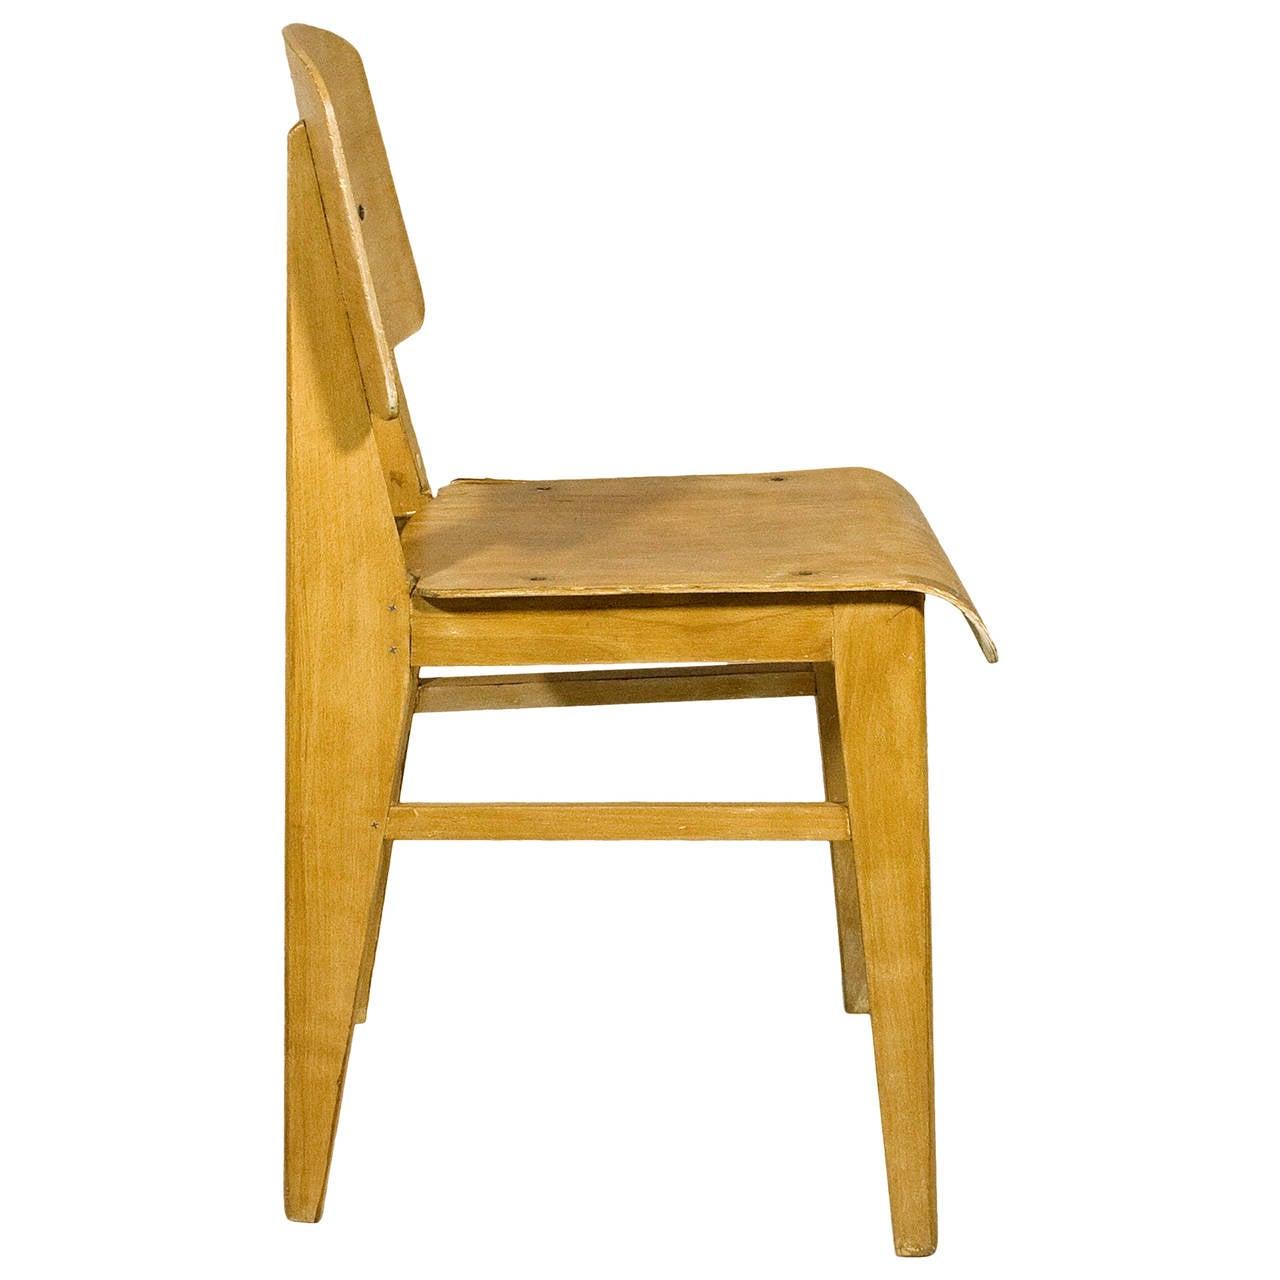 jean prouv chaise en bois wooden standard chair circa. Black Bedroom Furniture Sets. Home Design Ideas